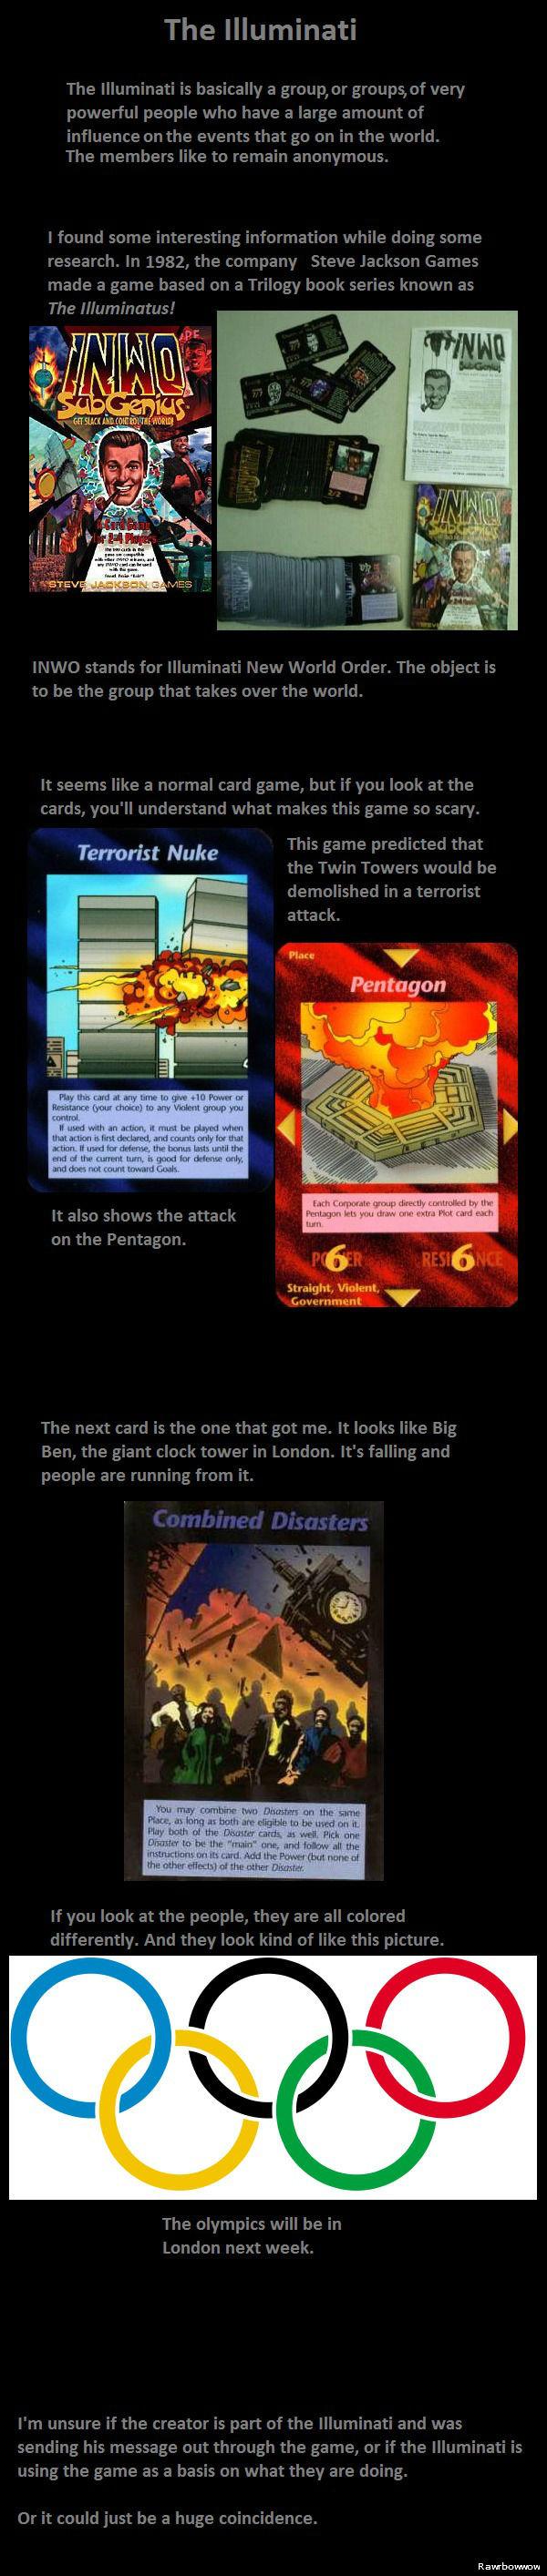 Illuminati. . Terrorist Nuke Flare V Pentagon mtg»: mu Eiri WWE ' T, Tpir tun. Actually its not predicting a disaster at the London Olympics, its predicting Mass Effect 3